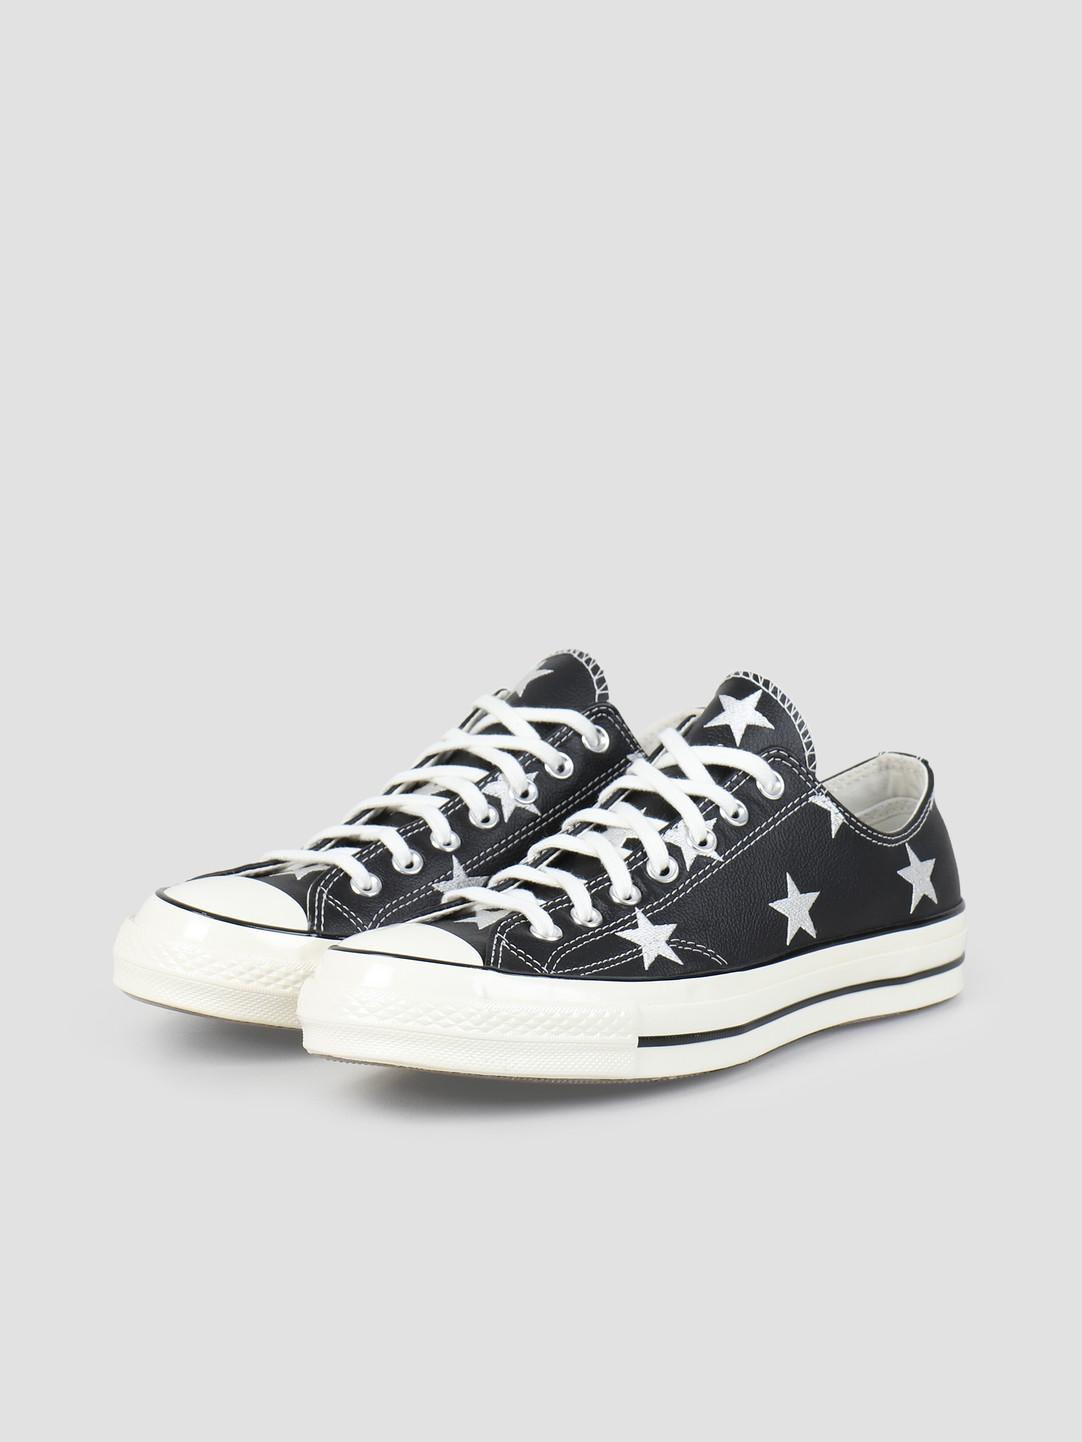 Converse Converse Chuck 70 OX Black Egret White 165964C